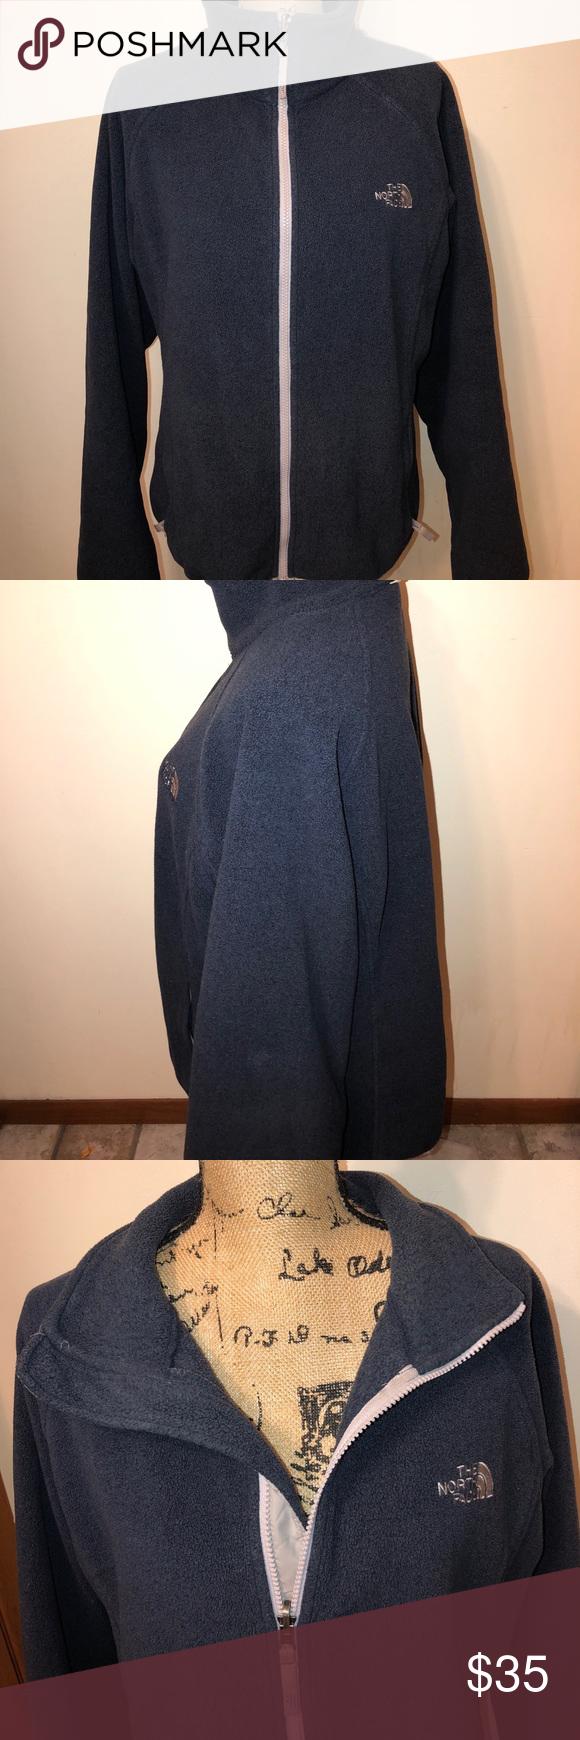 The north face zip up fleece jacket size xl North face women Zip